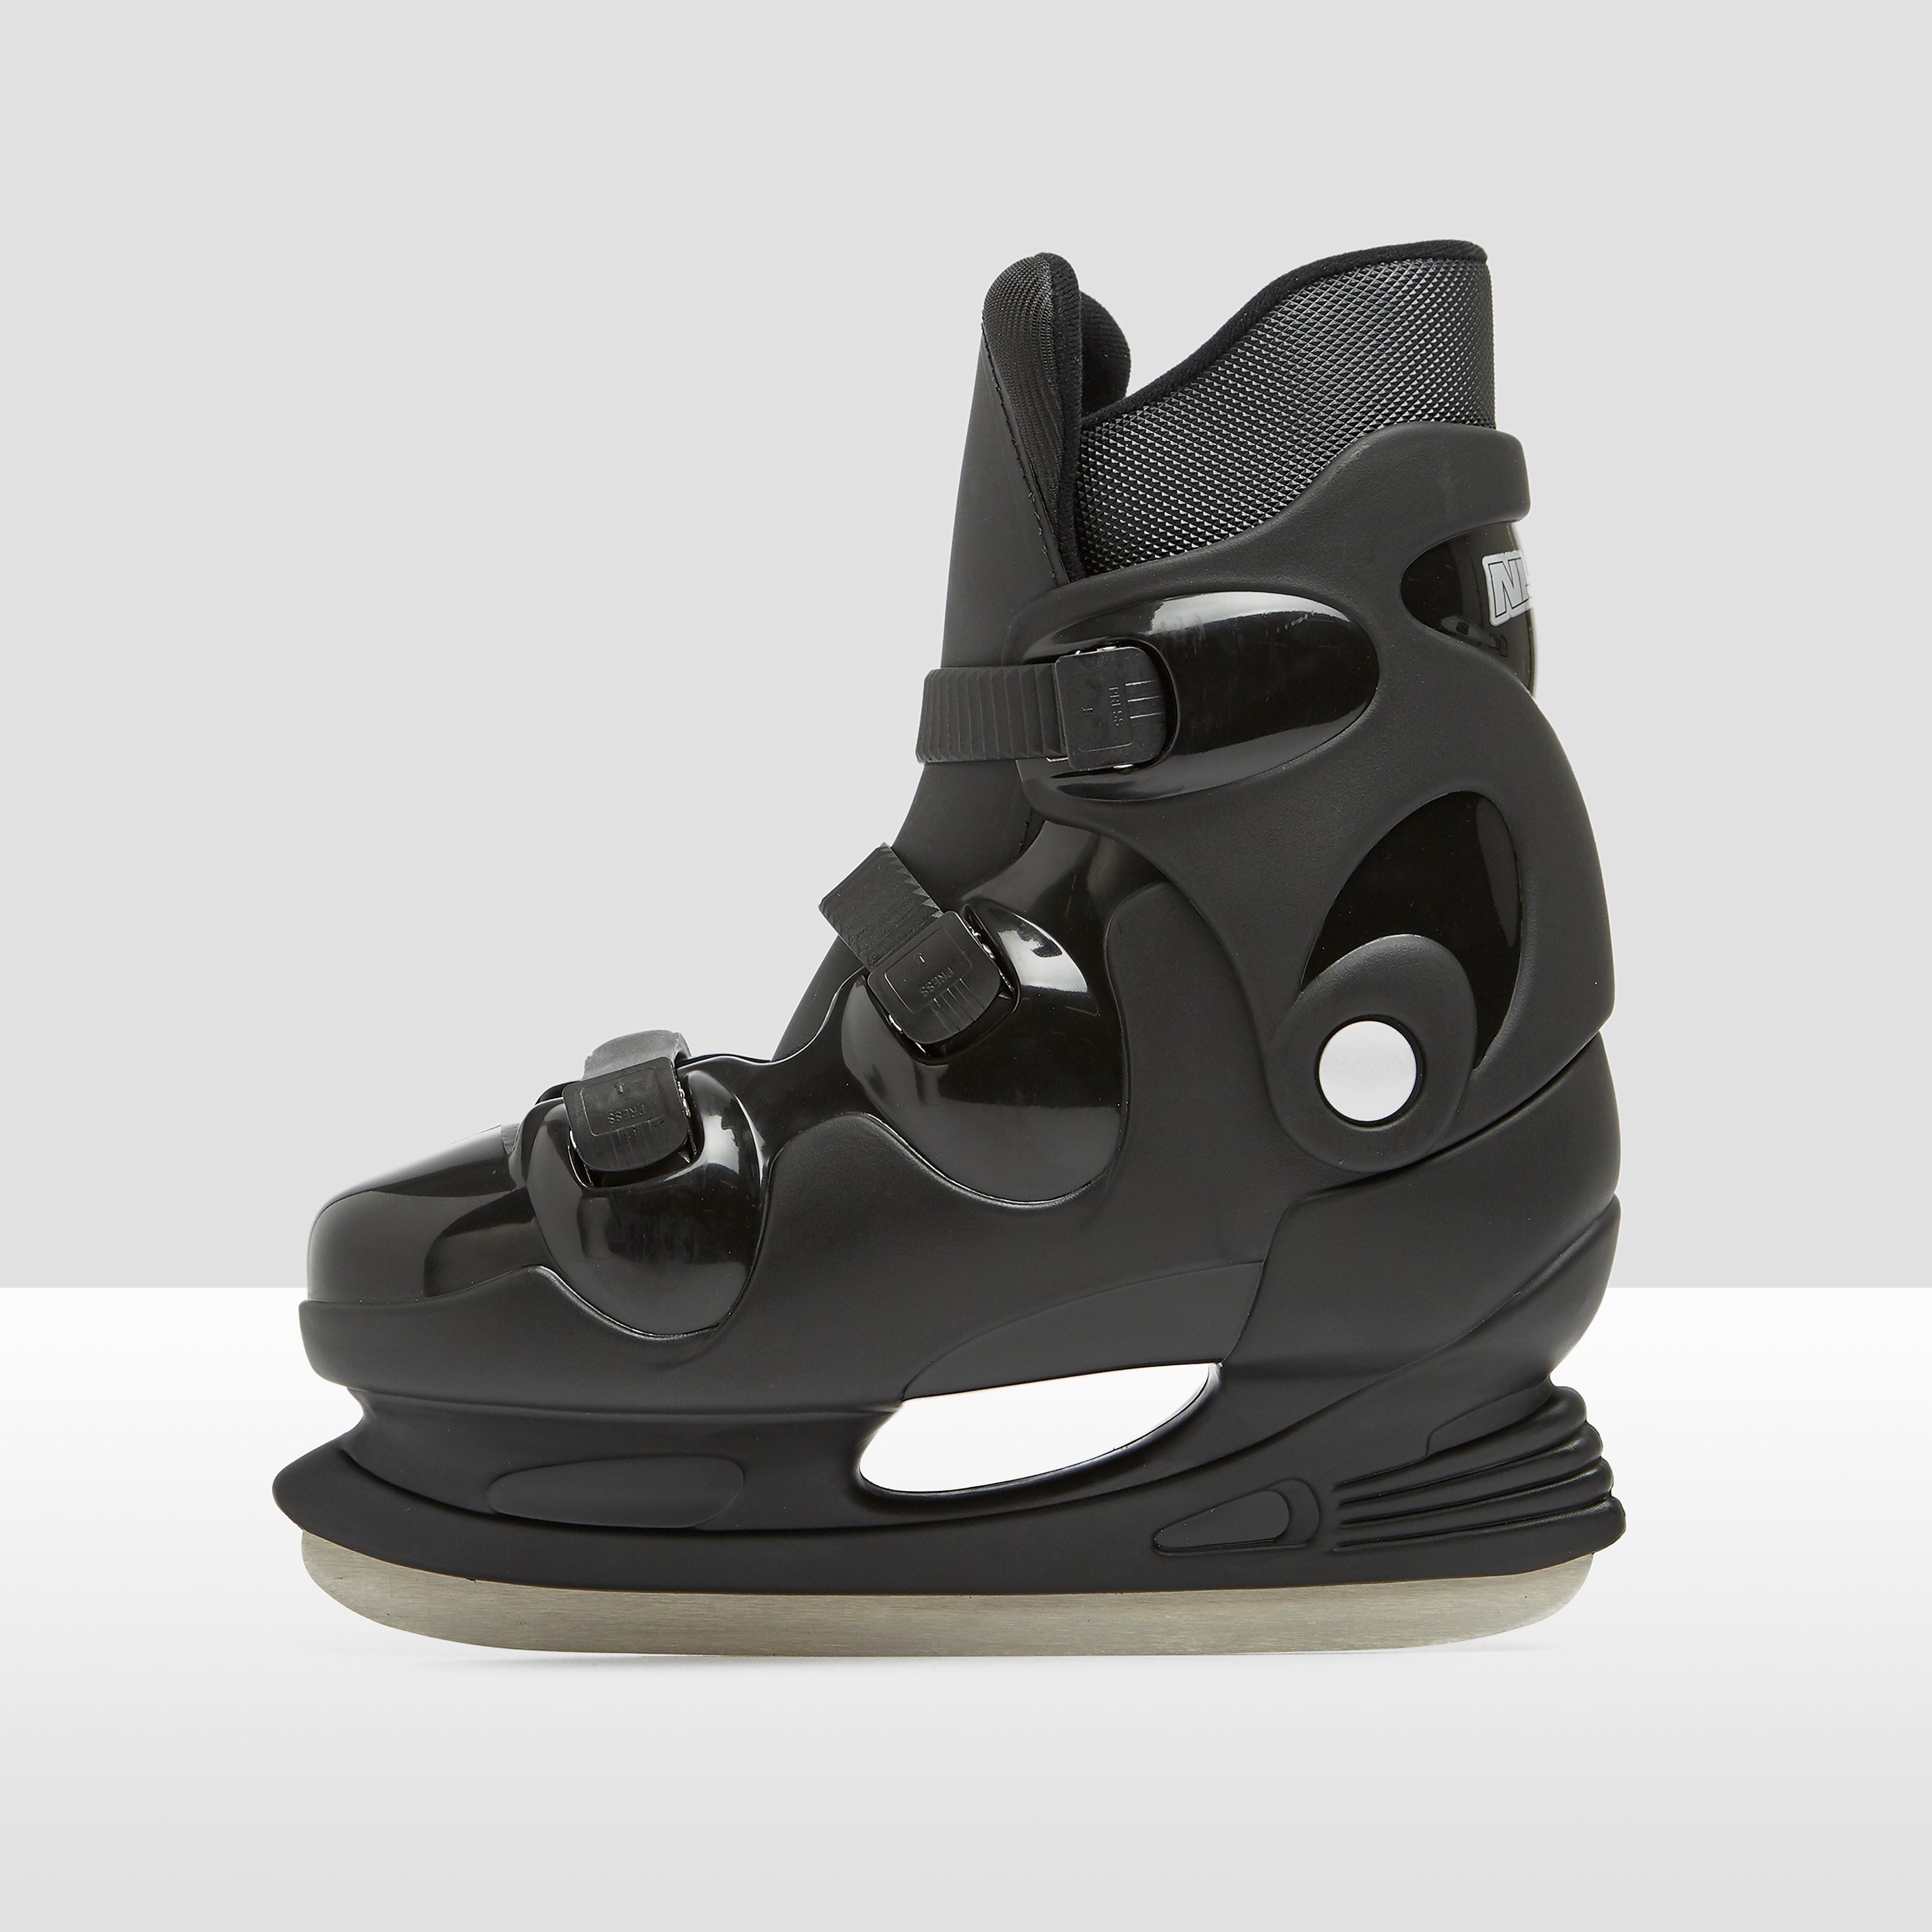 Nijdam hardboot ijshockeyschaatsen zwart